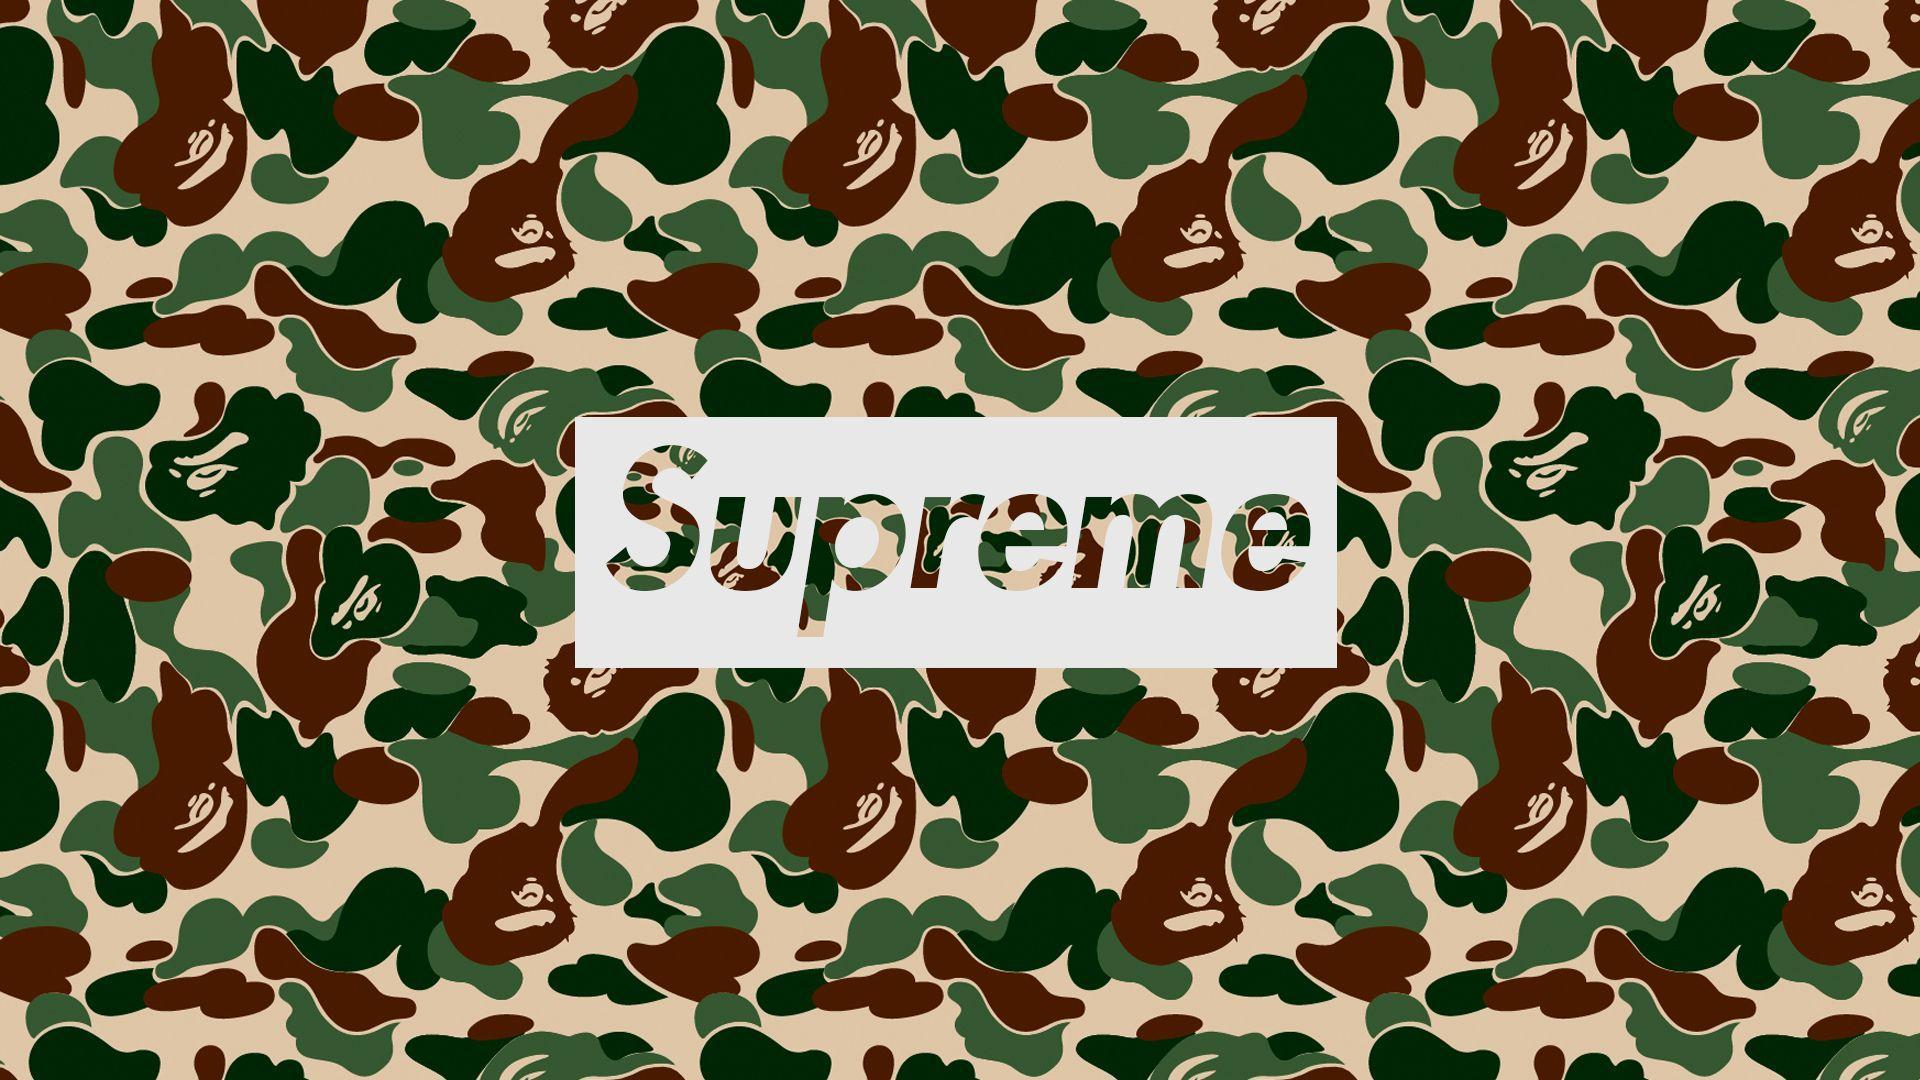 Supreme BAPE Wallpapers - Top Free Supreme BAPE ...